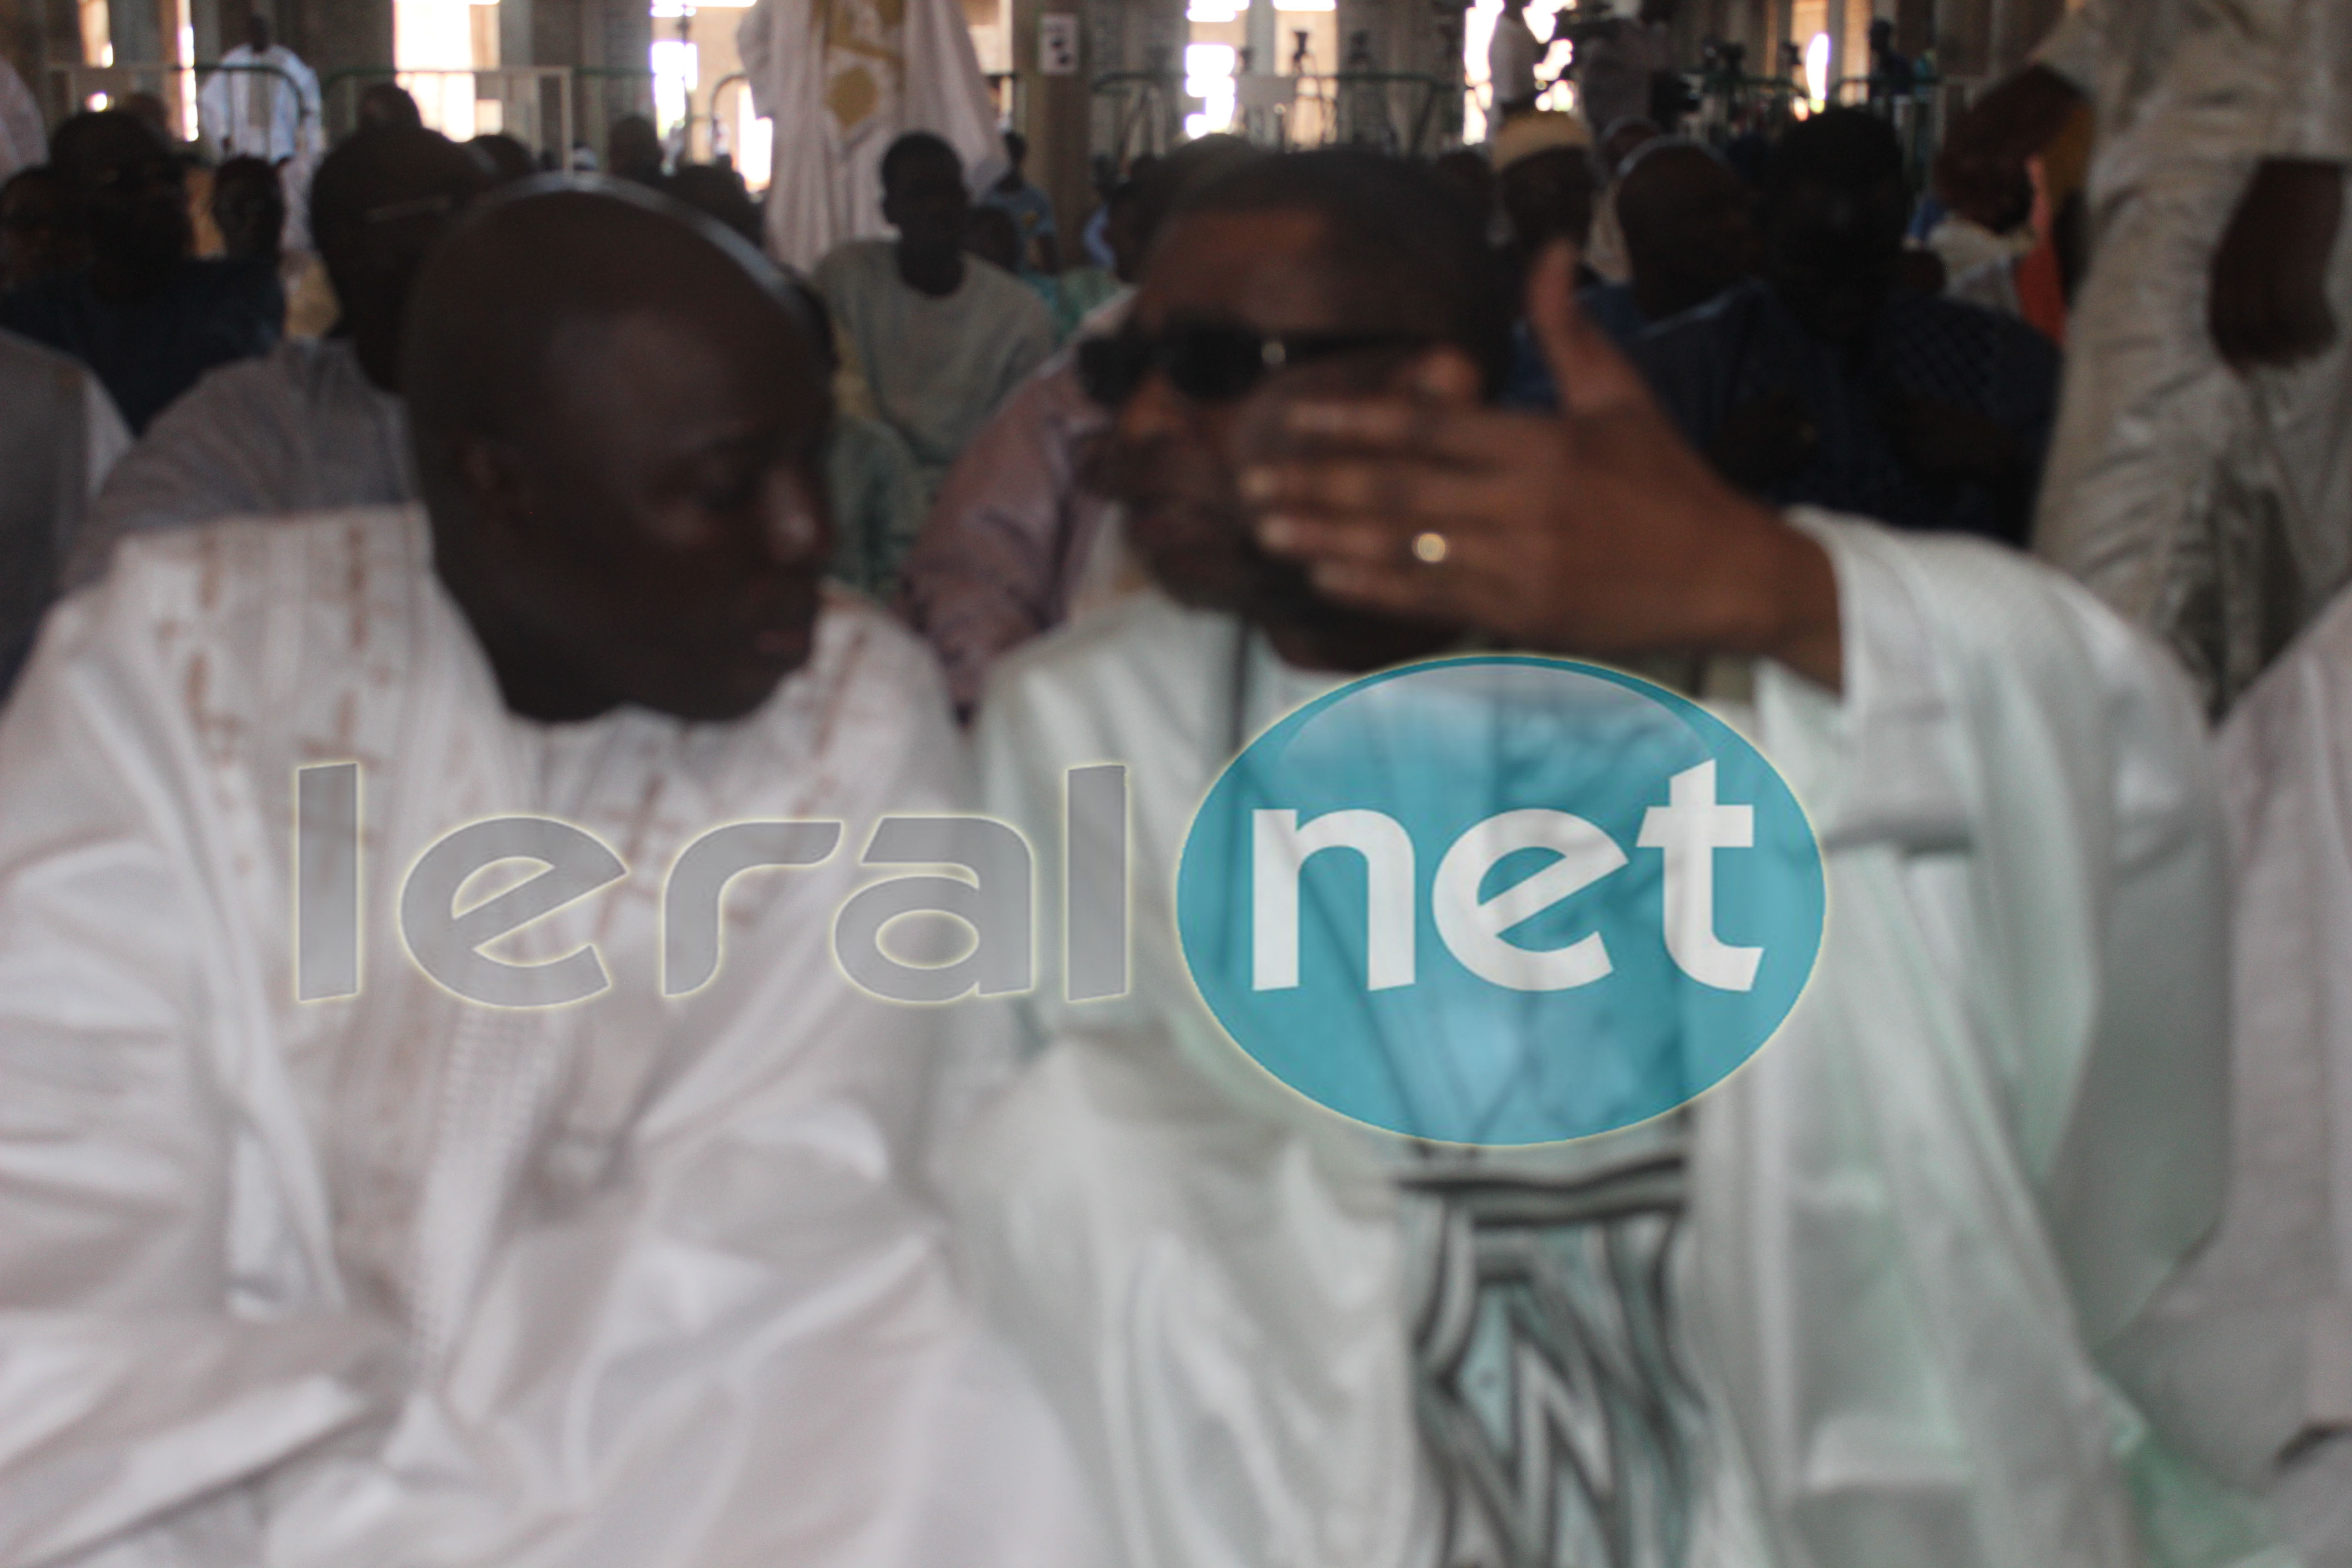 TABASKI : Youssou  Ndour et le ministre Arona Coumba Ndoffène Diouf au premier rang